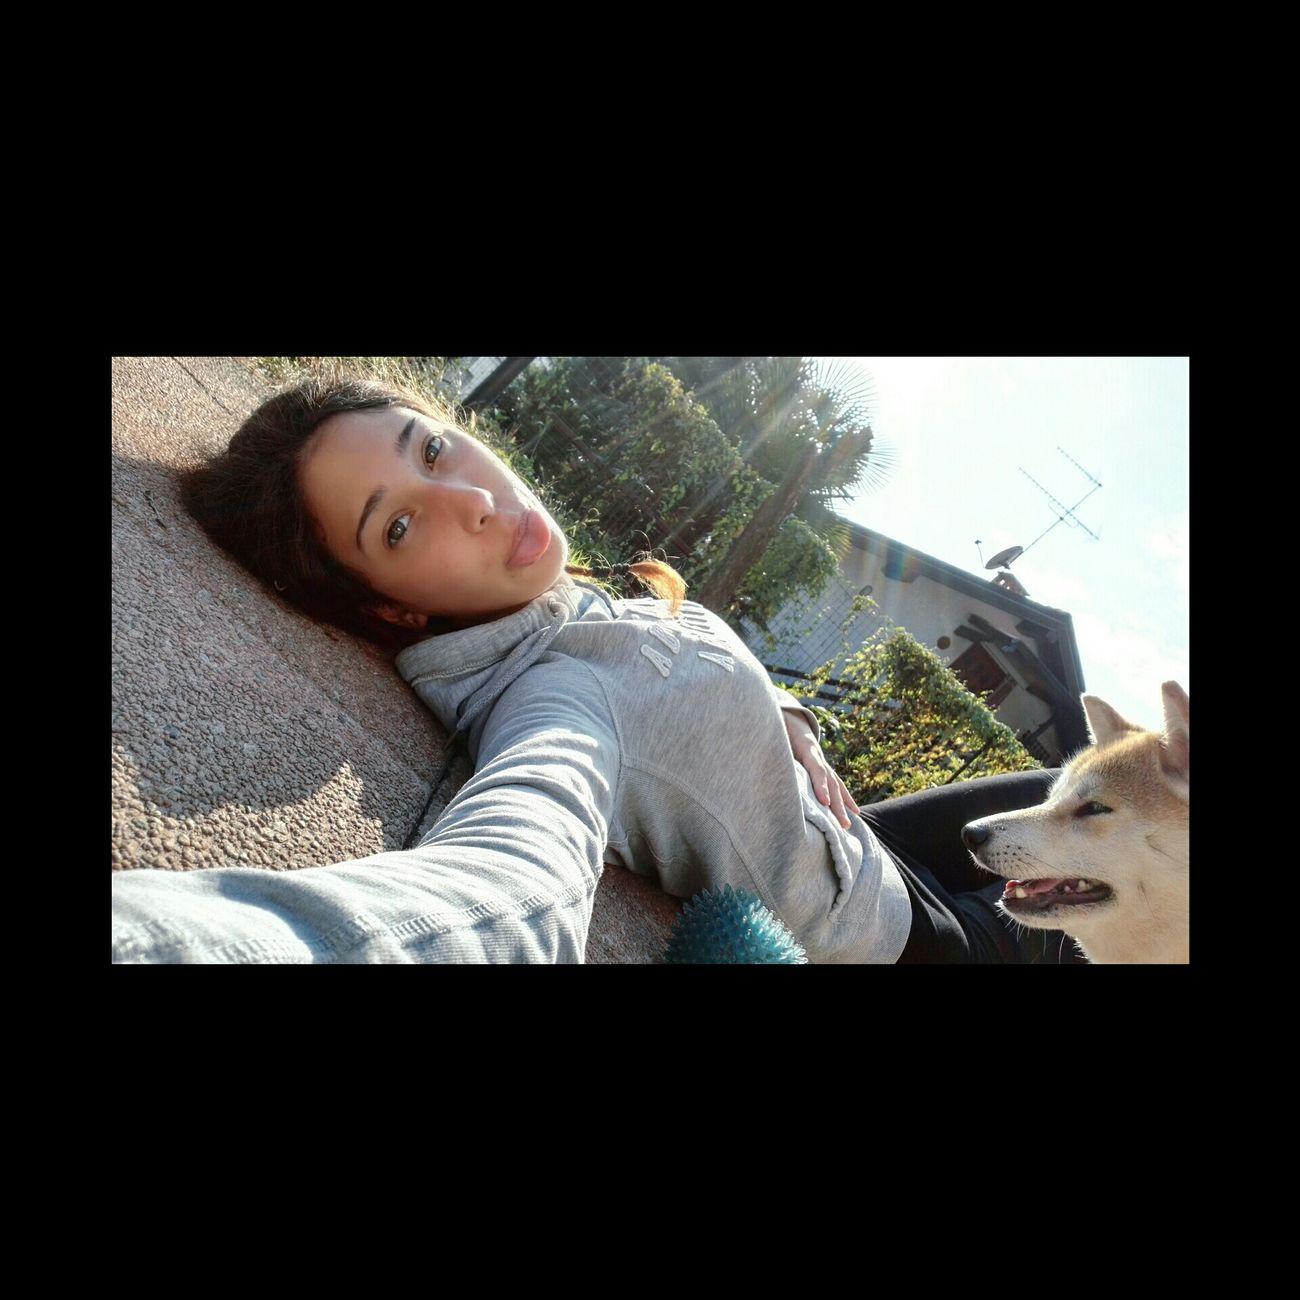 Dog❤ Shiba Inu Relax Photo Potography Love Animals Cheese! Mlmlml